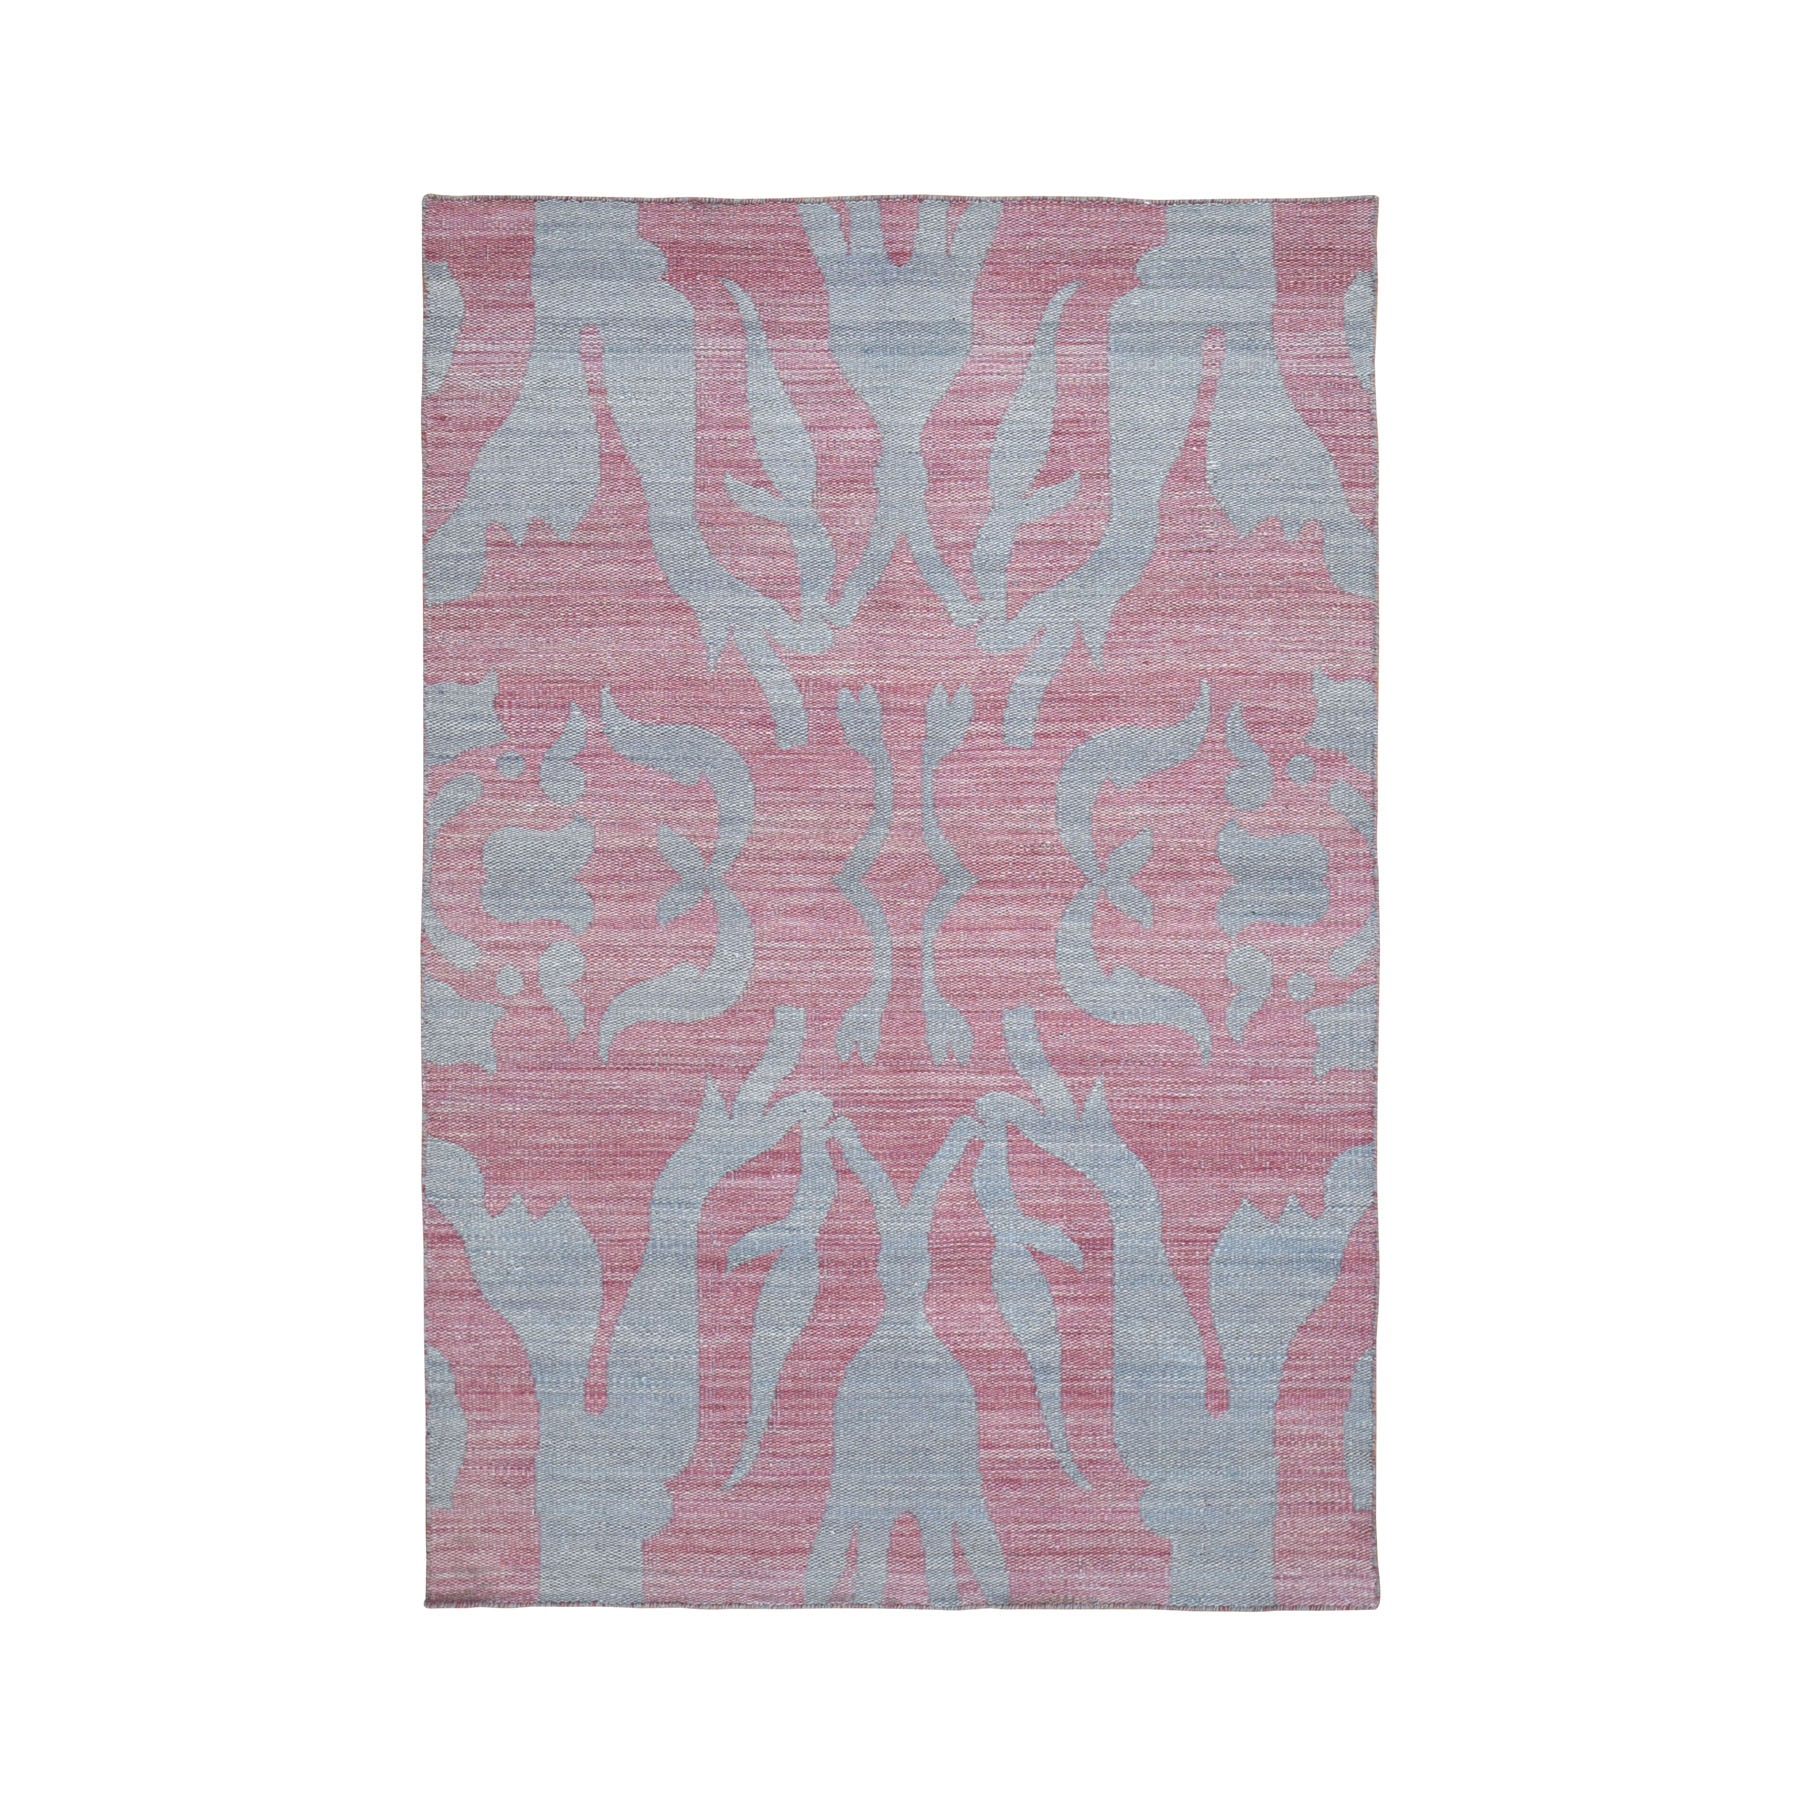 4'x6' Pure Wool Reversible Kilim Flat Weave Hand Woven Oriental Rug